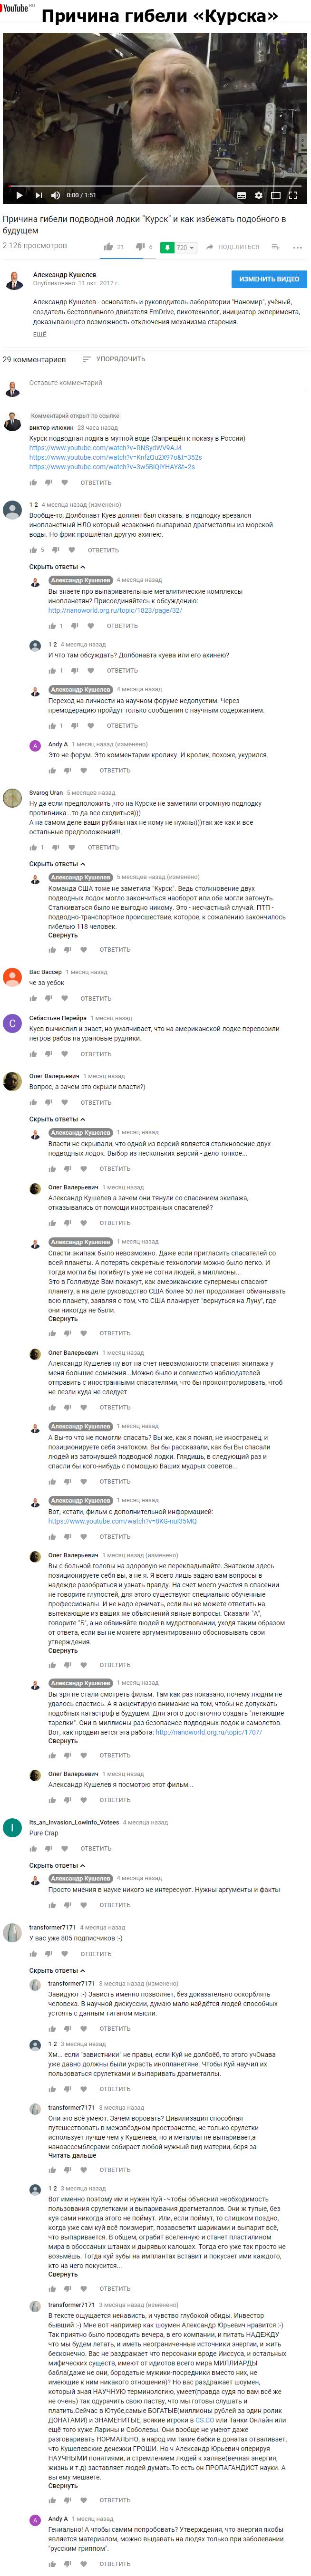 https://img-fotki.yandex.ru/get/369579/158289418.4db/0_18fdd6_e7e4d266_orig.png